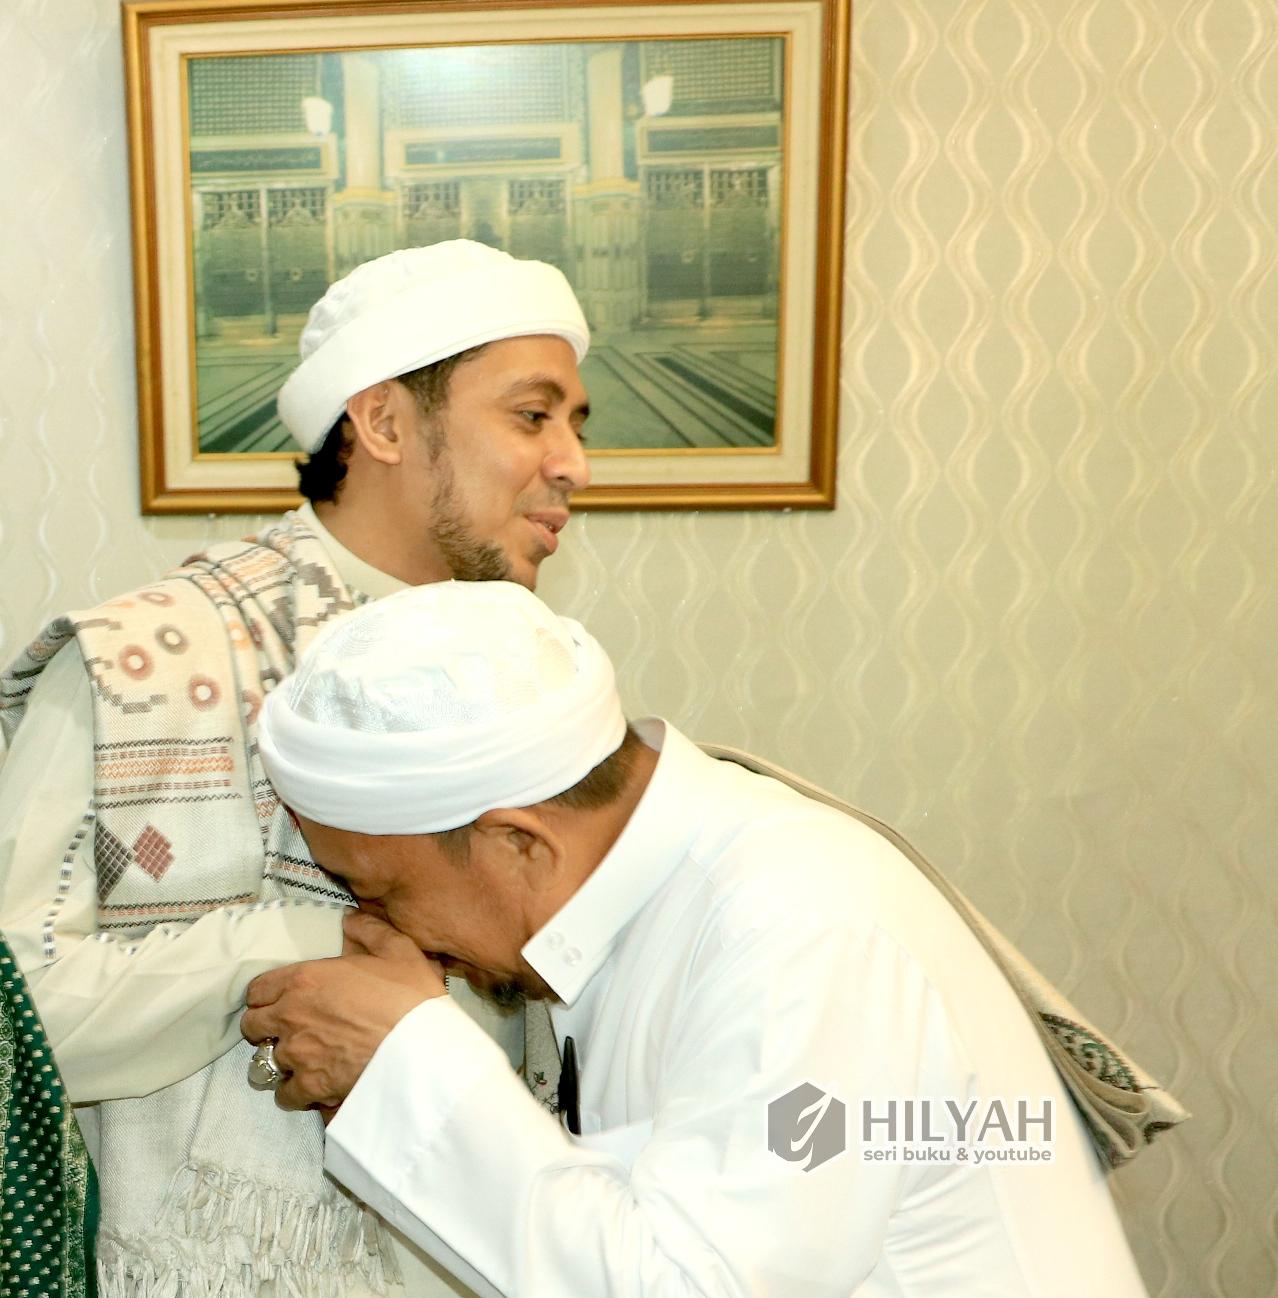 Khutbah Idul Adha Habib Ali bin Hasan Baharun Pengasuh Pon Pes Dalwa Baalawi download teks khutbah